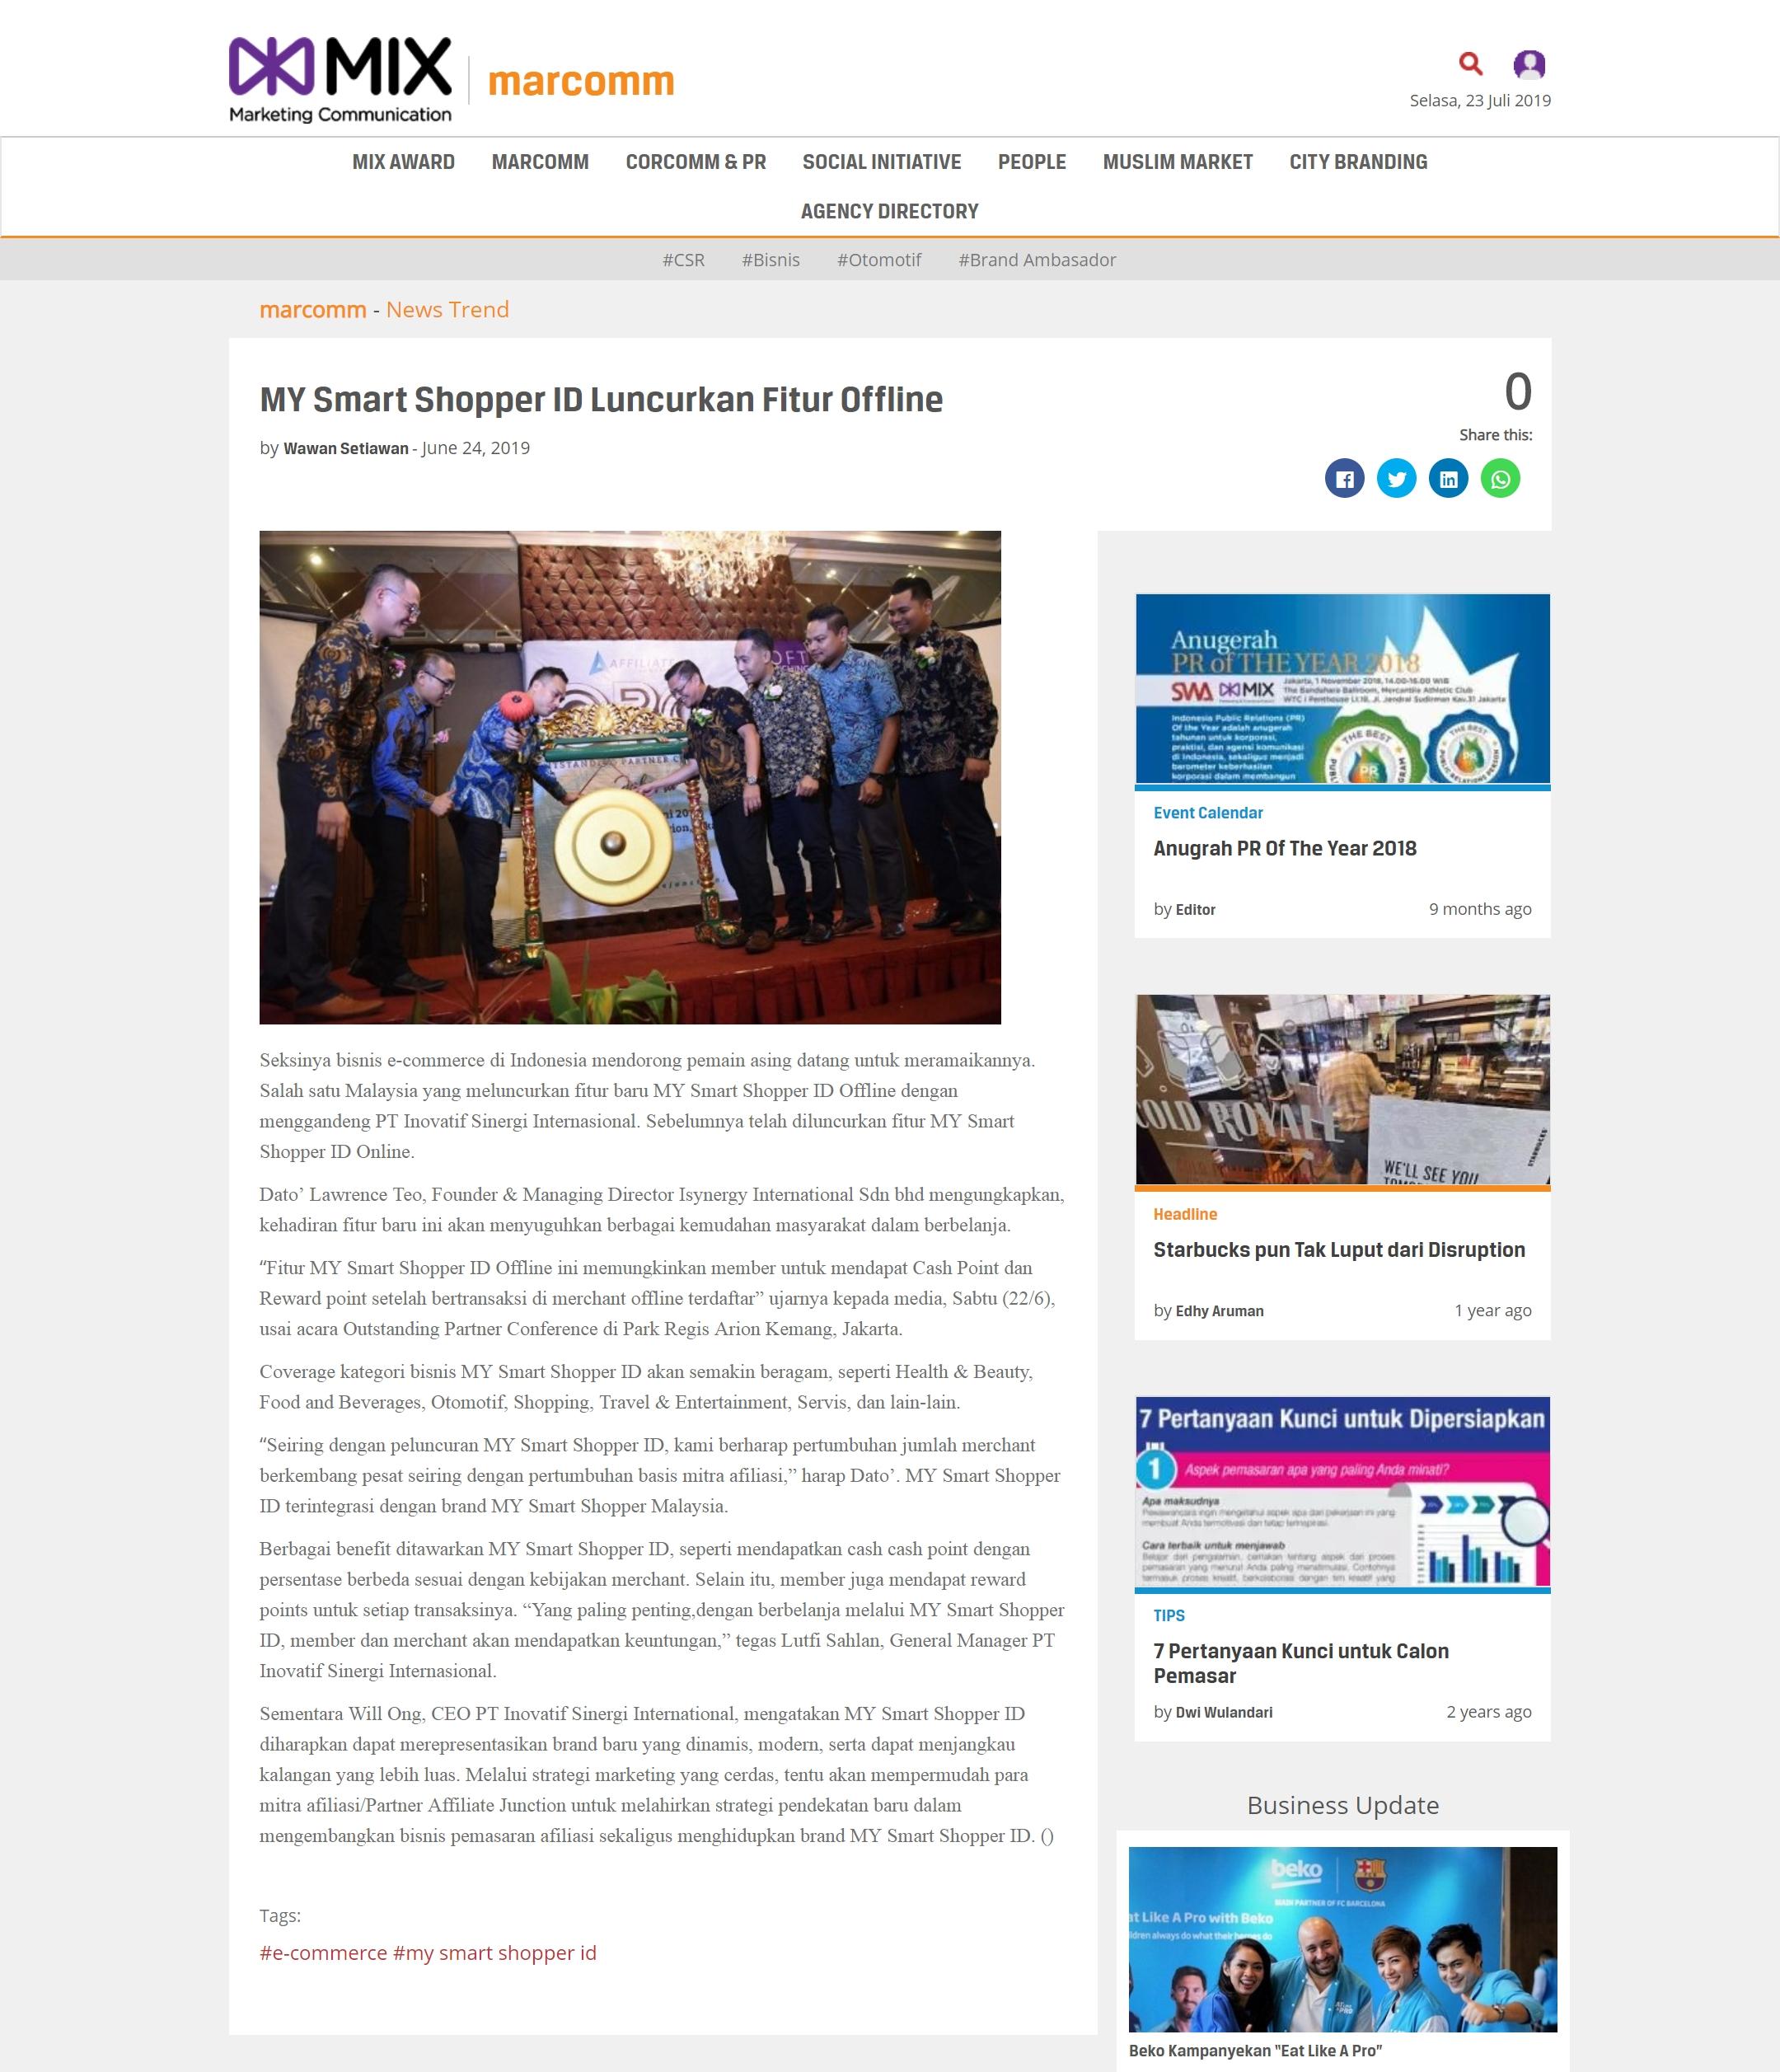 MarcommNews_MYSmartShopperIDLuncurkanFiturOffline_24June2019